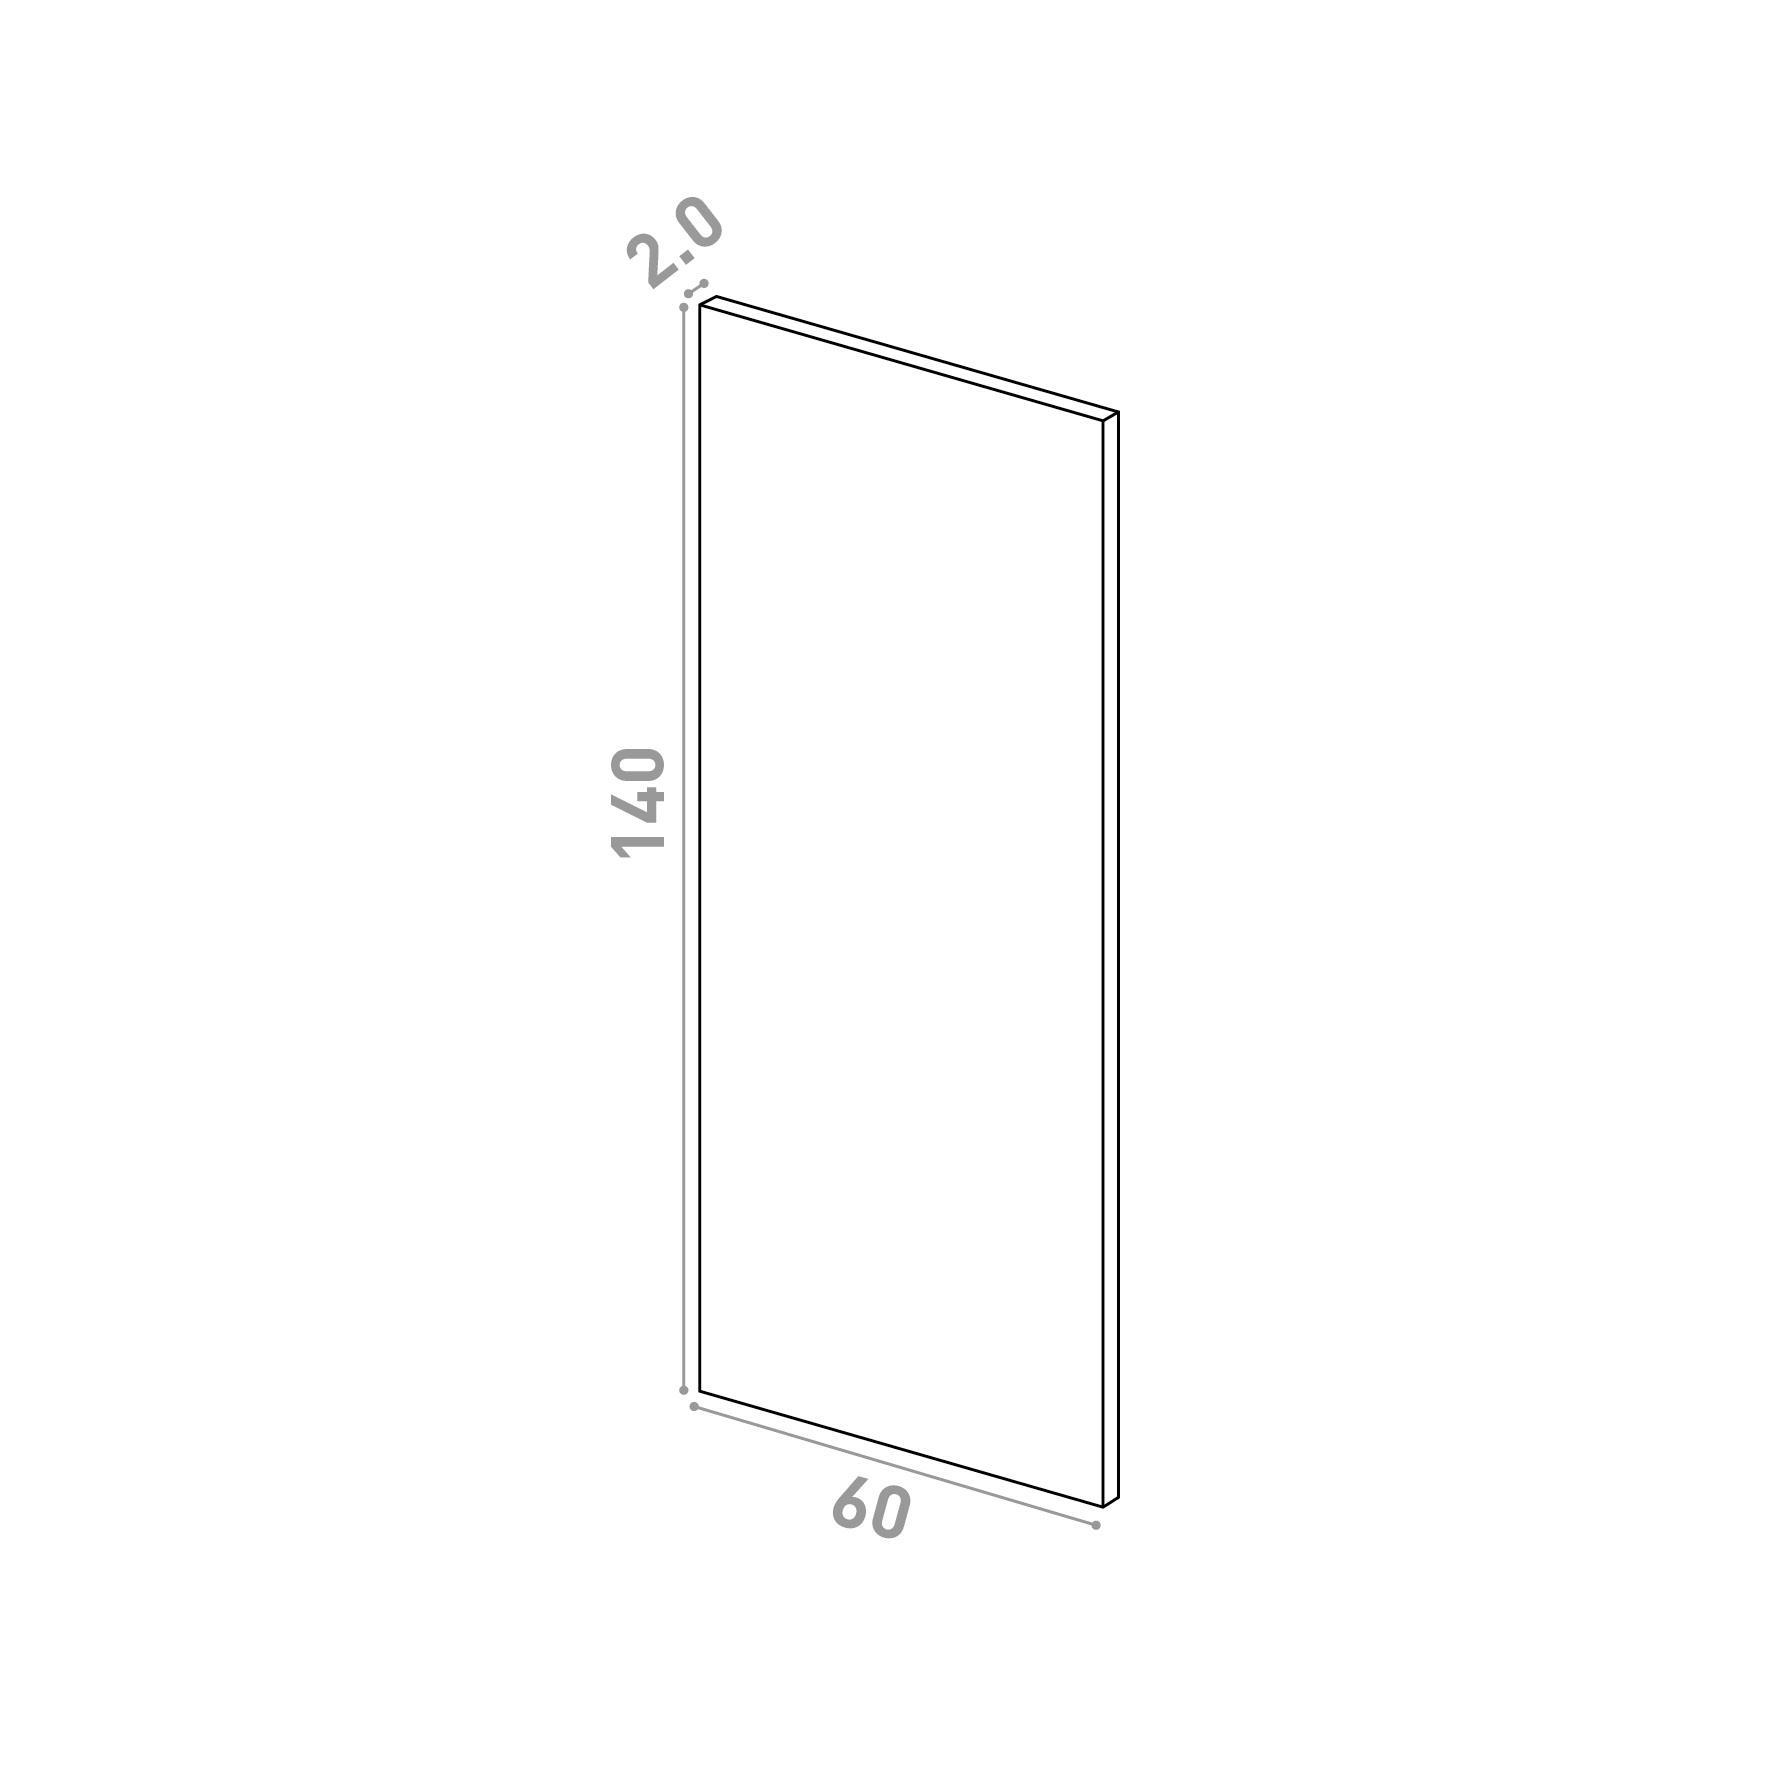 Porte 60X140cm   design lisse   chêne naturel